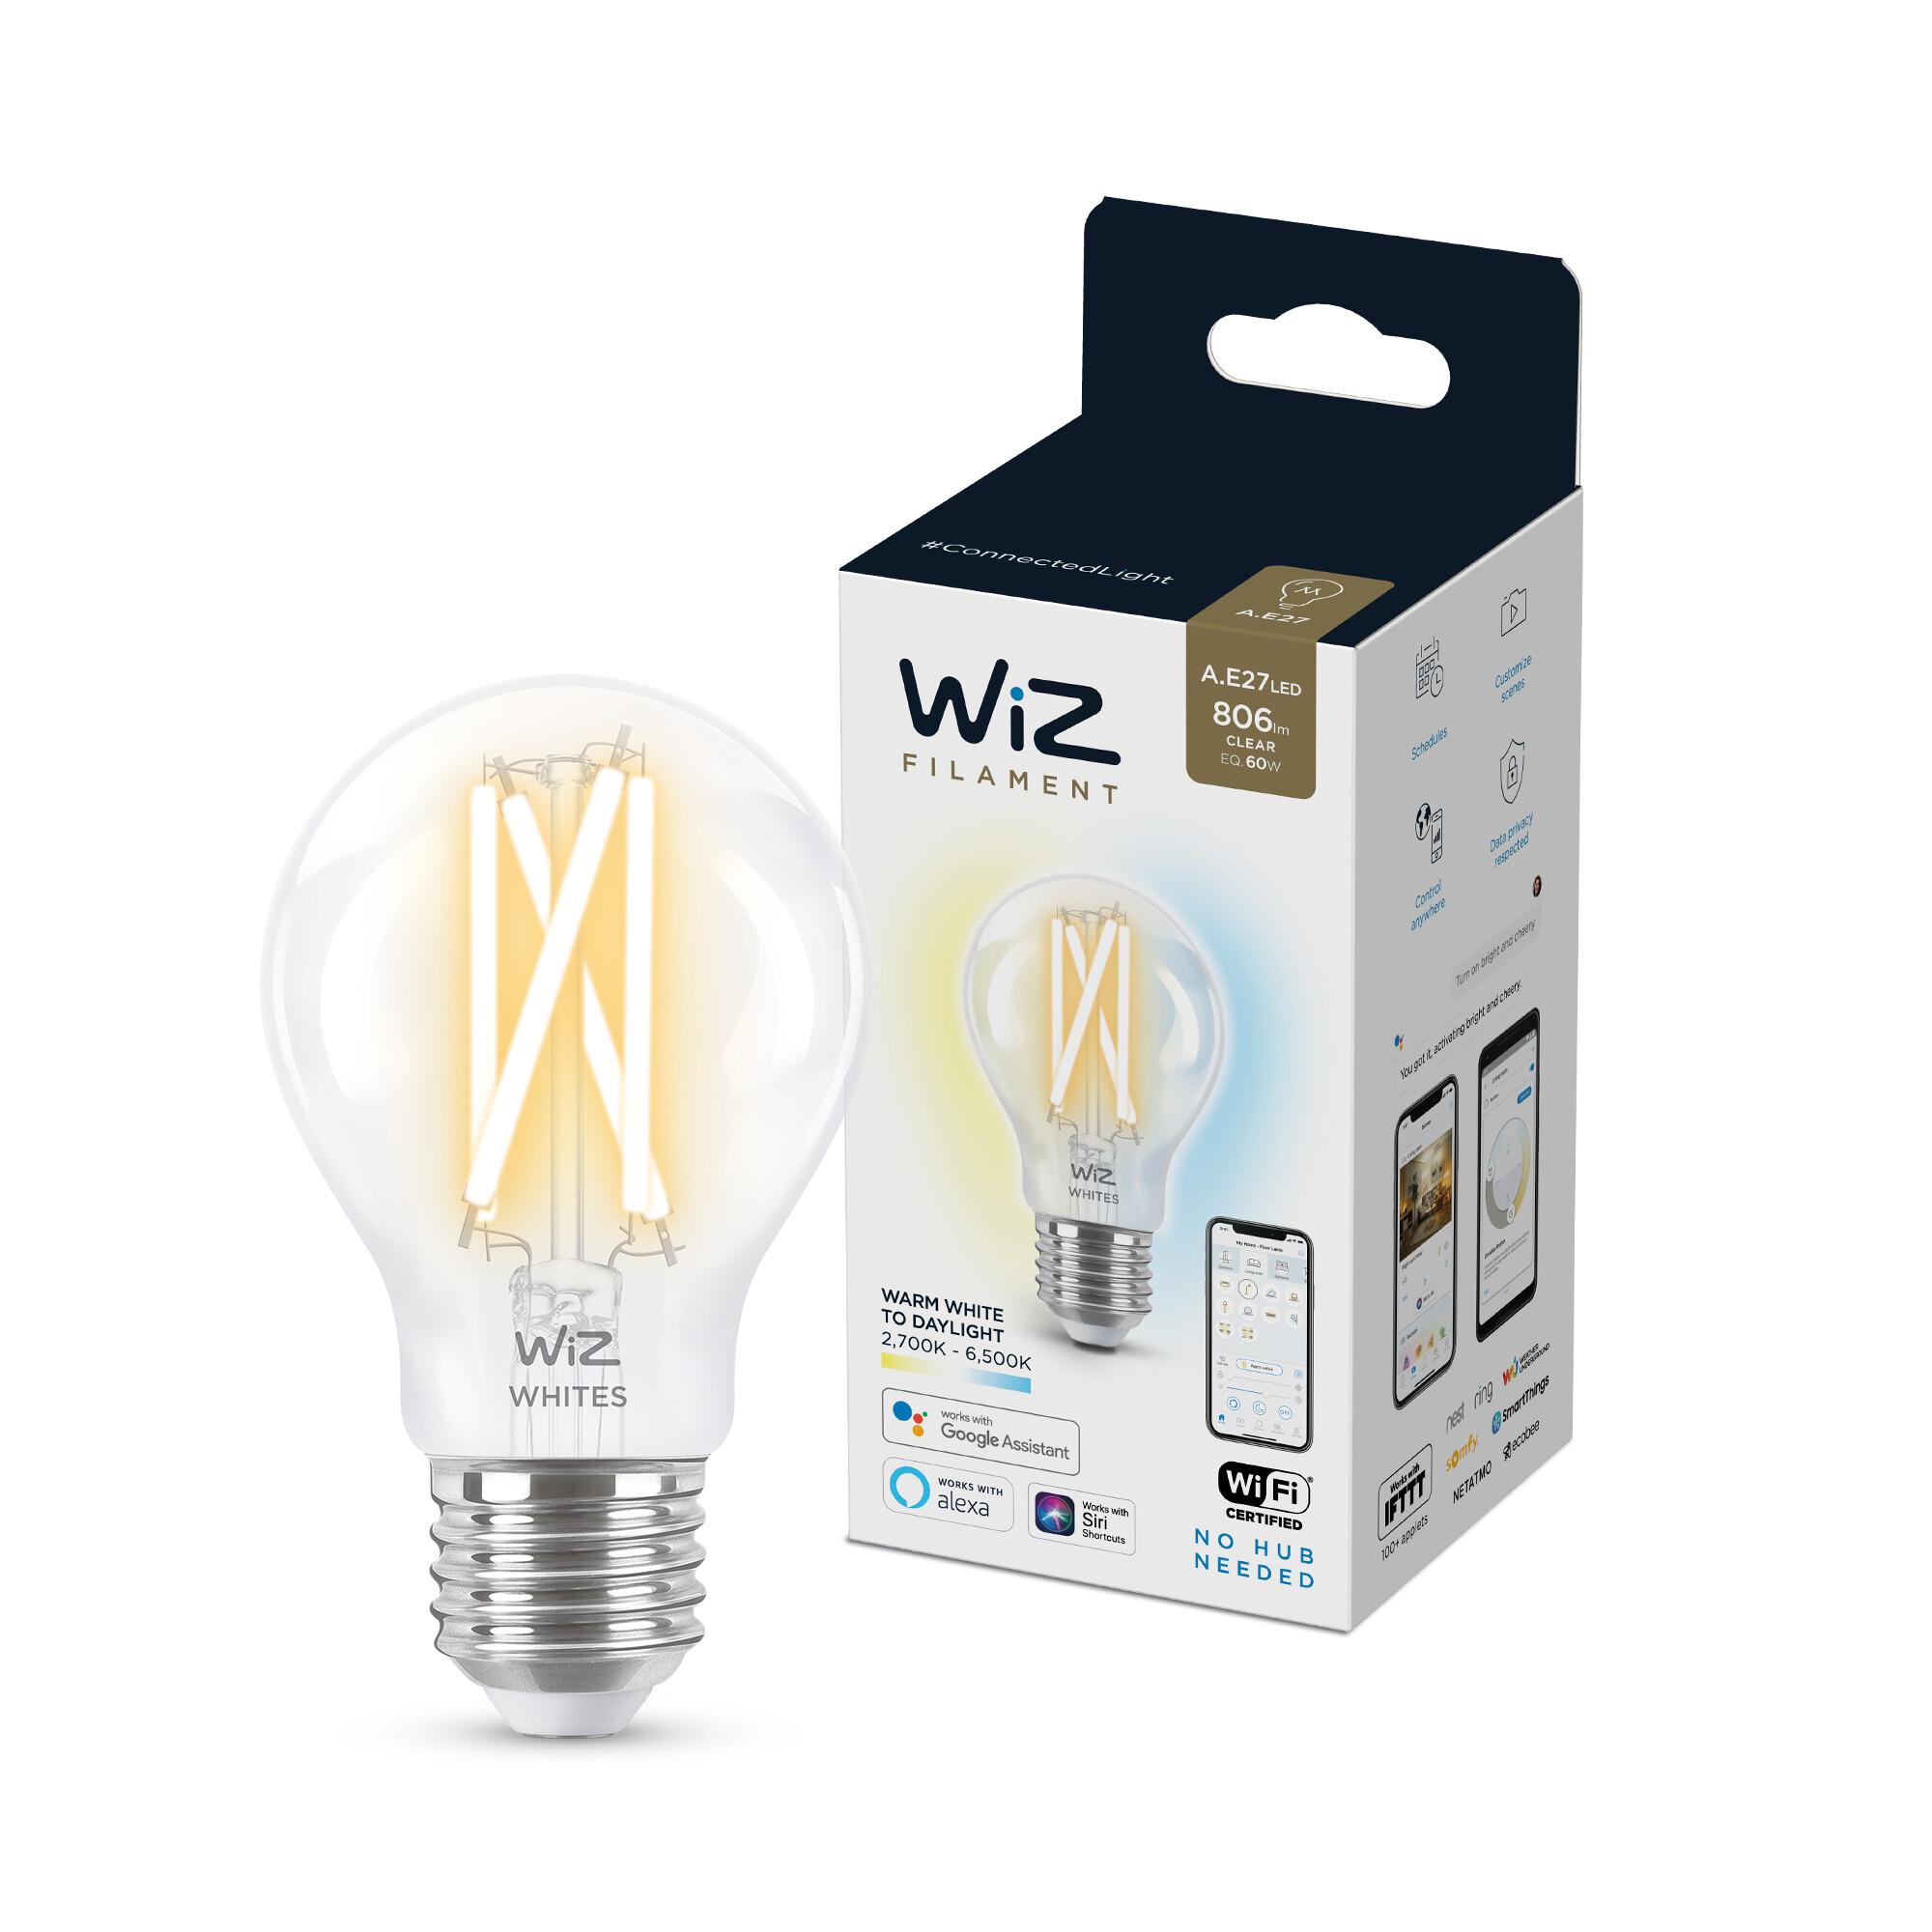 WiZ E27 60W 806lm 2700K Lamp Transparant